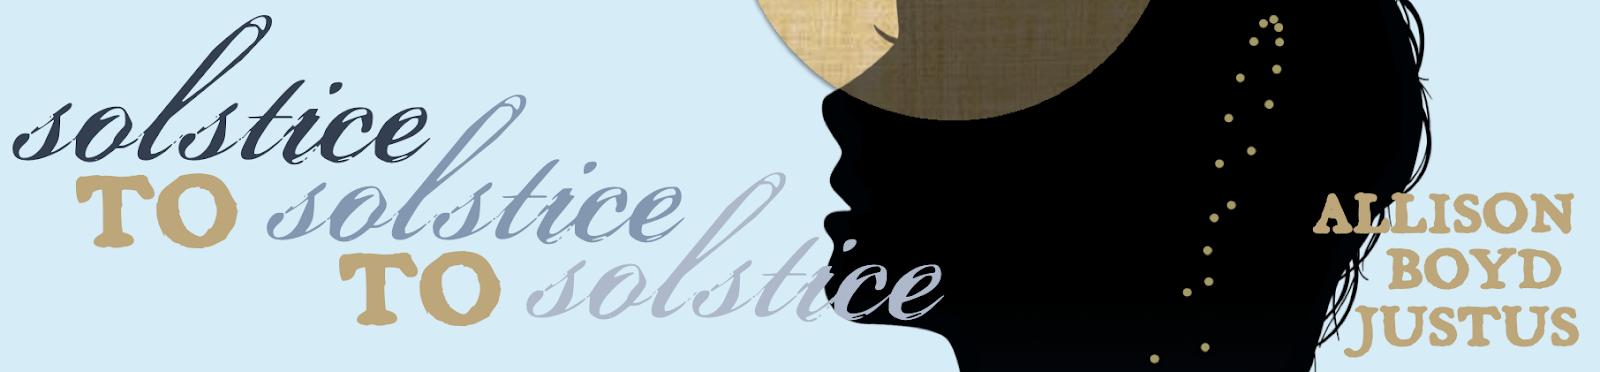 Solstice to Solstice to Solstice header banner